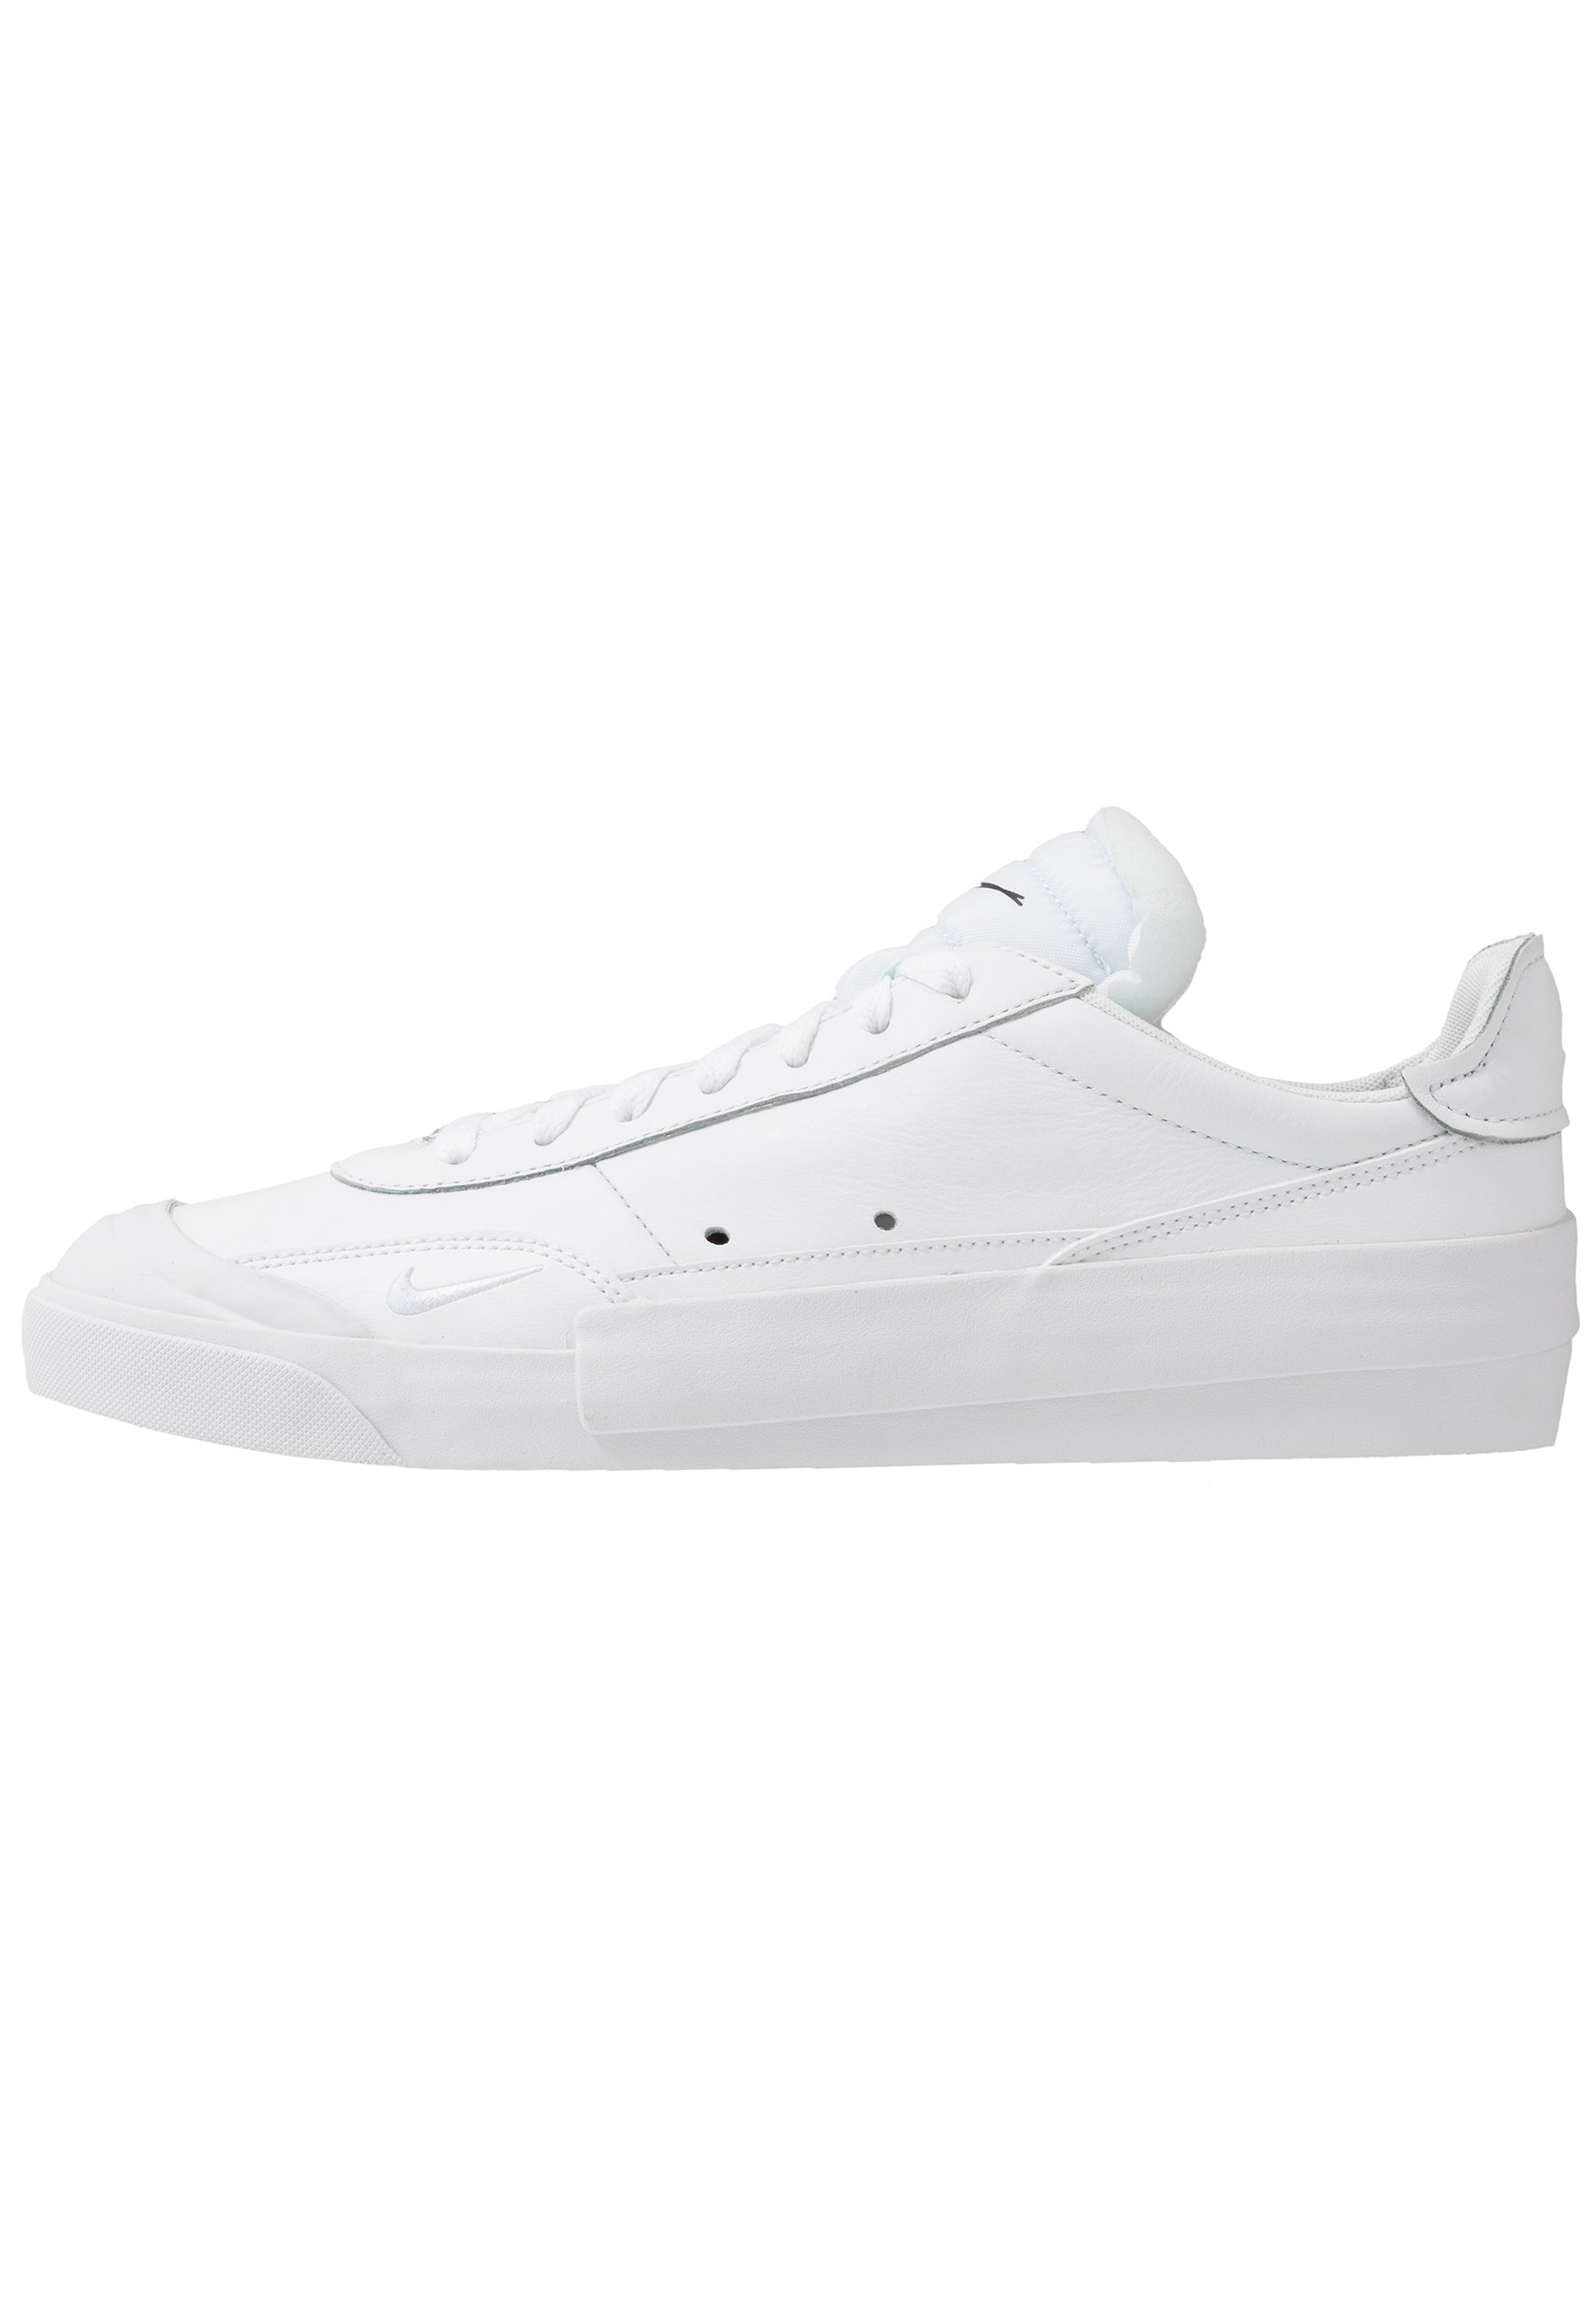 Nike Sportswear DROP TYPE PRM Joggesko whiteblackhvit